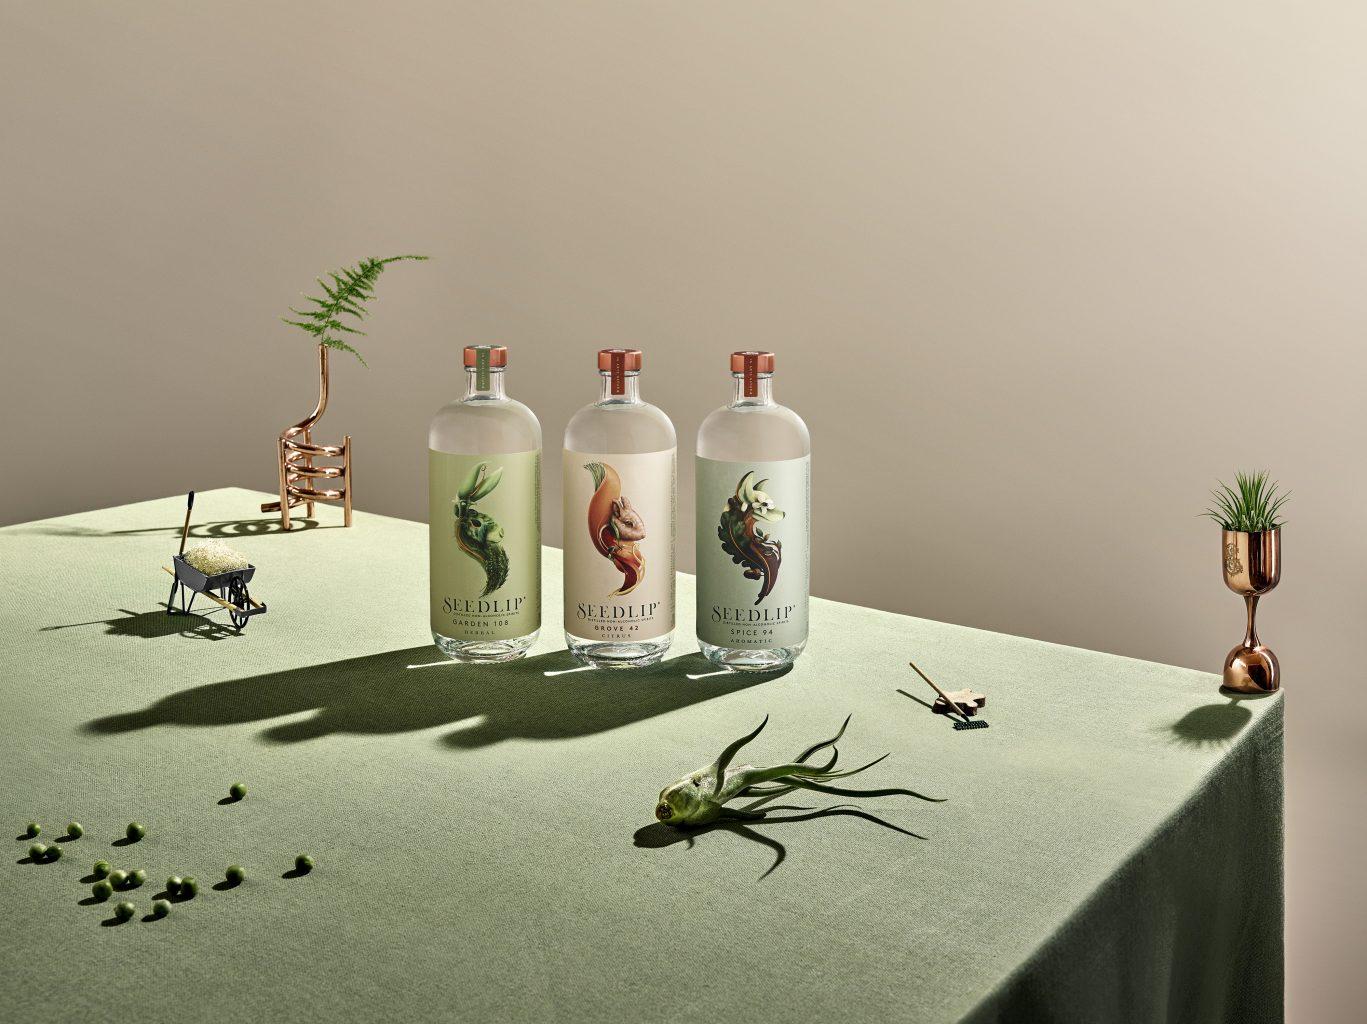 S2 Bottles 272 master 04a | Seedlip